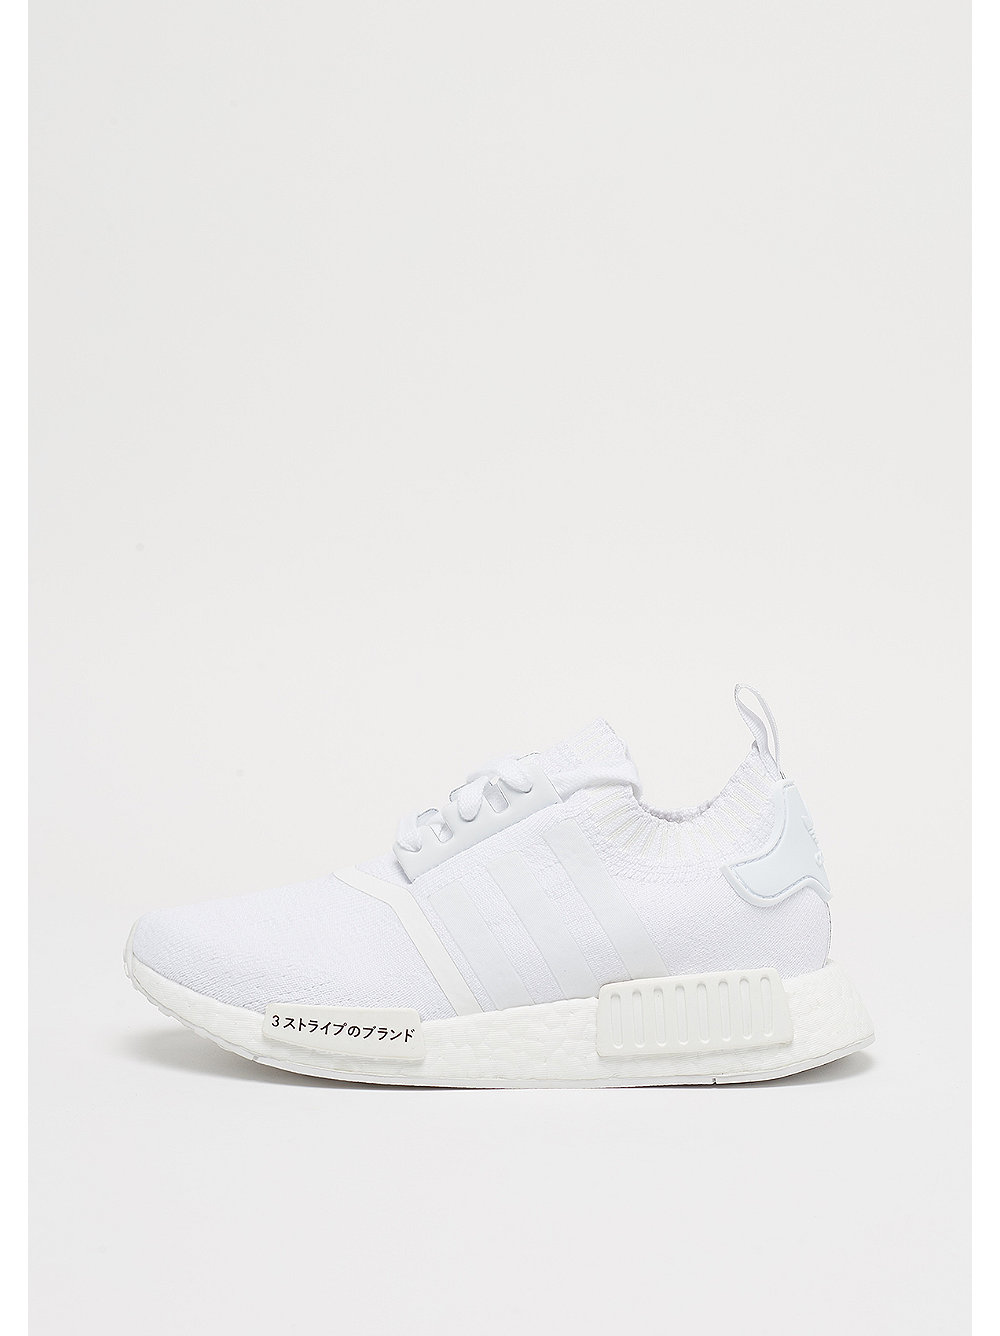 adidas NMD R1 PK white im SNIPES Onlineshop - associate-degree.de 87f18fb05d